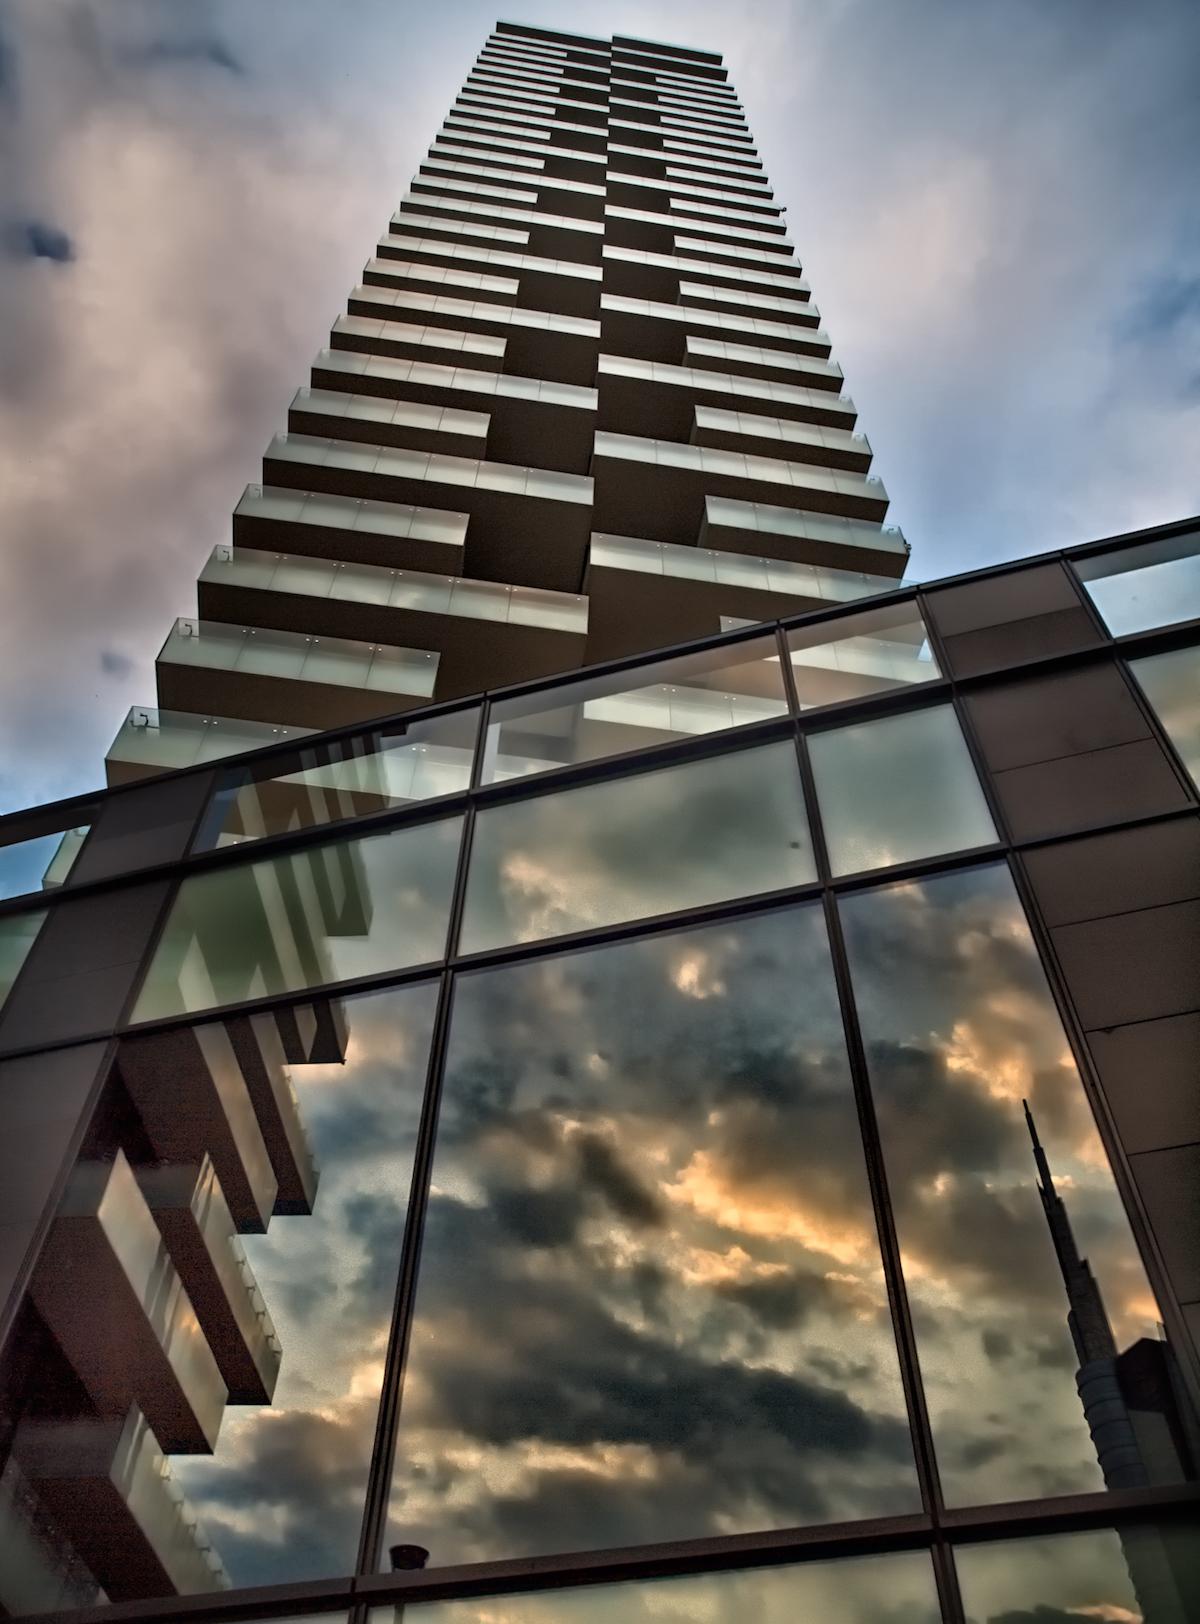 Title: The new city Medium: digital photo Size: 30x40